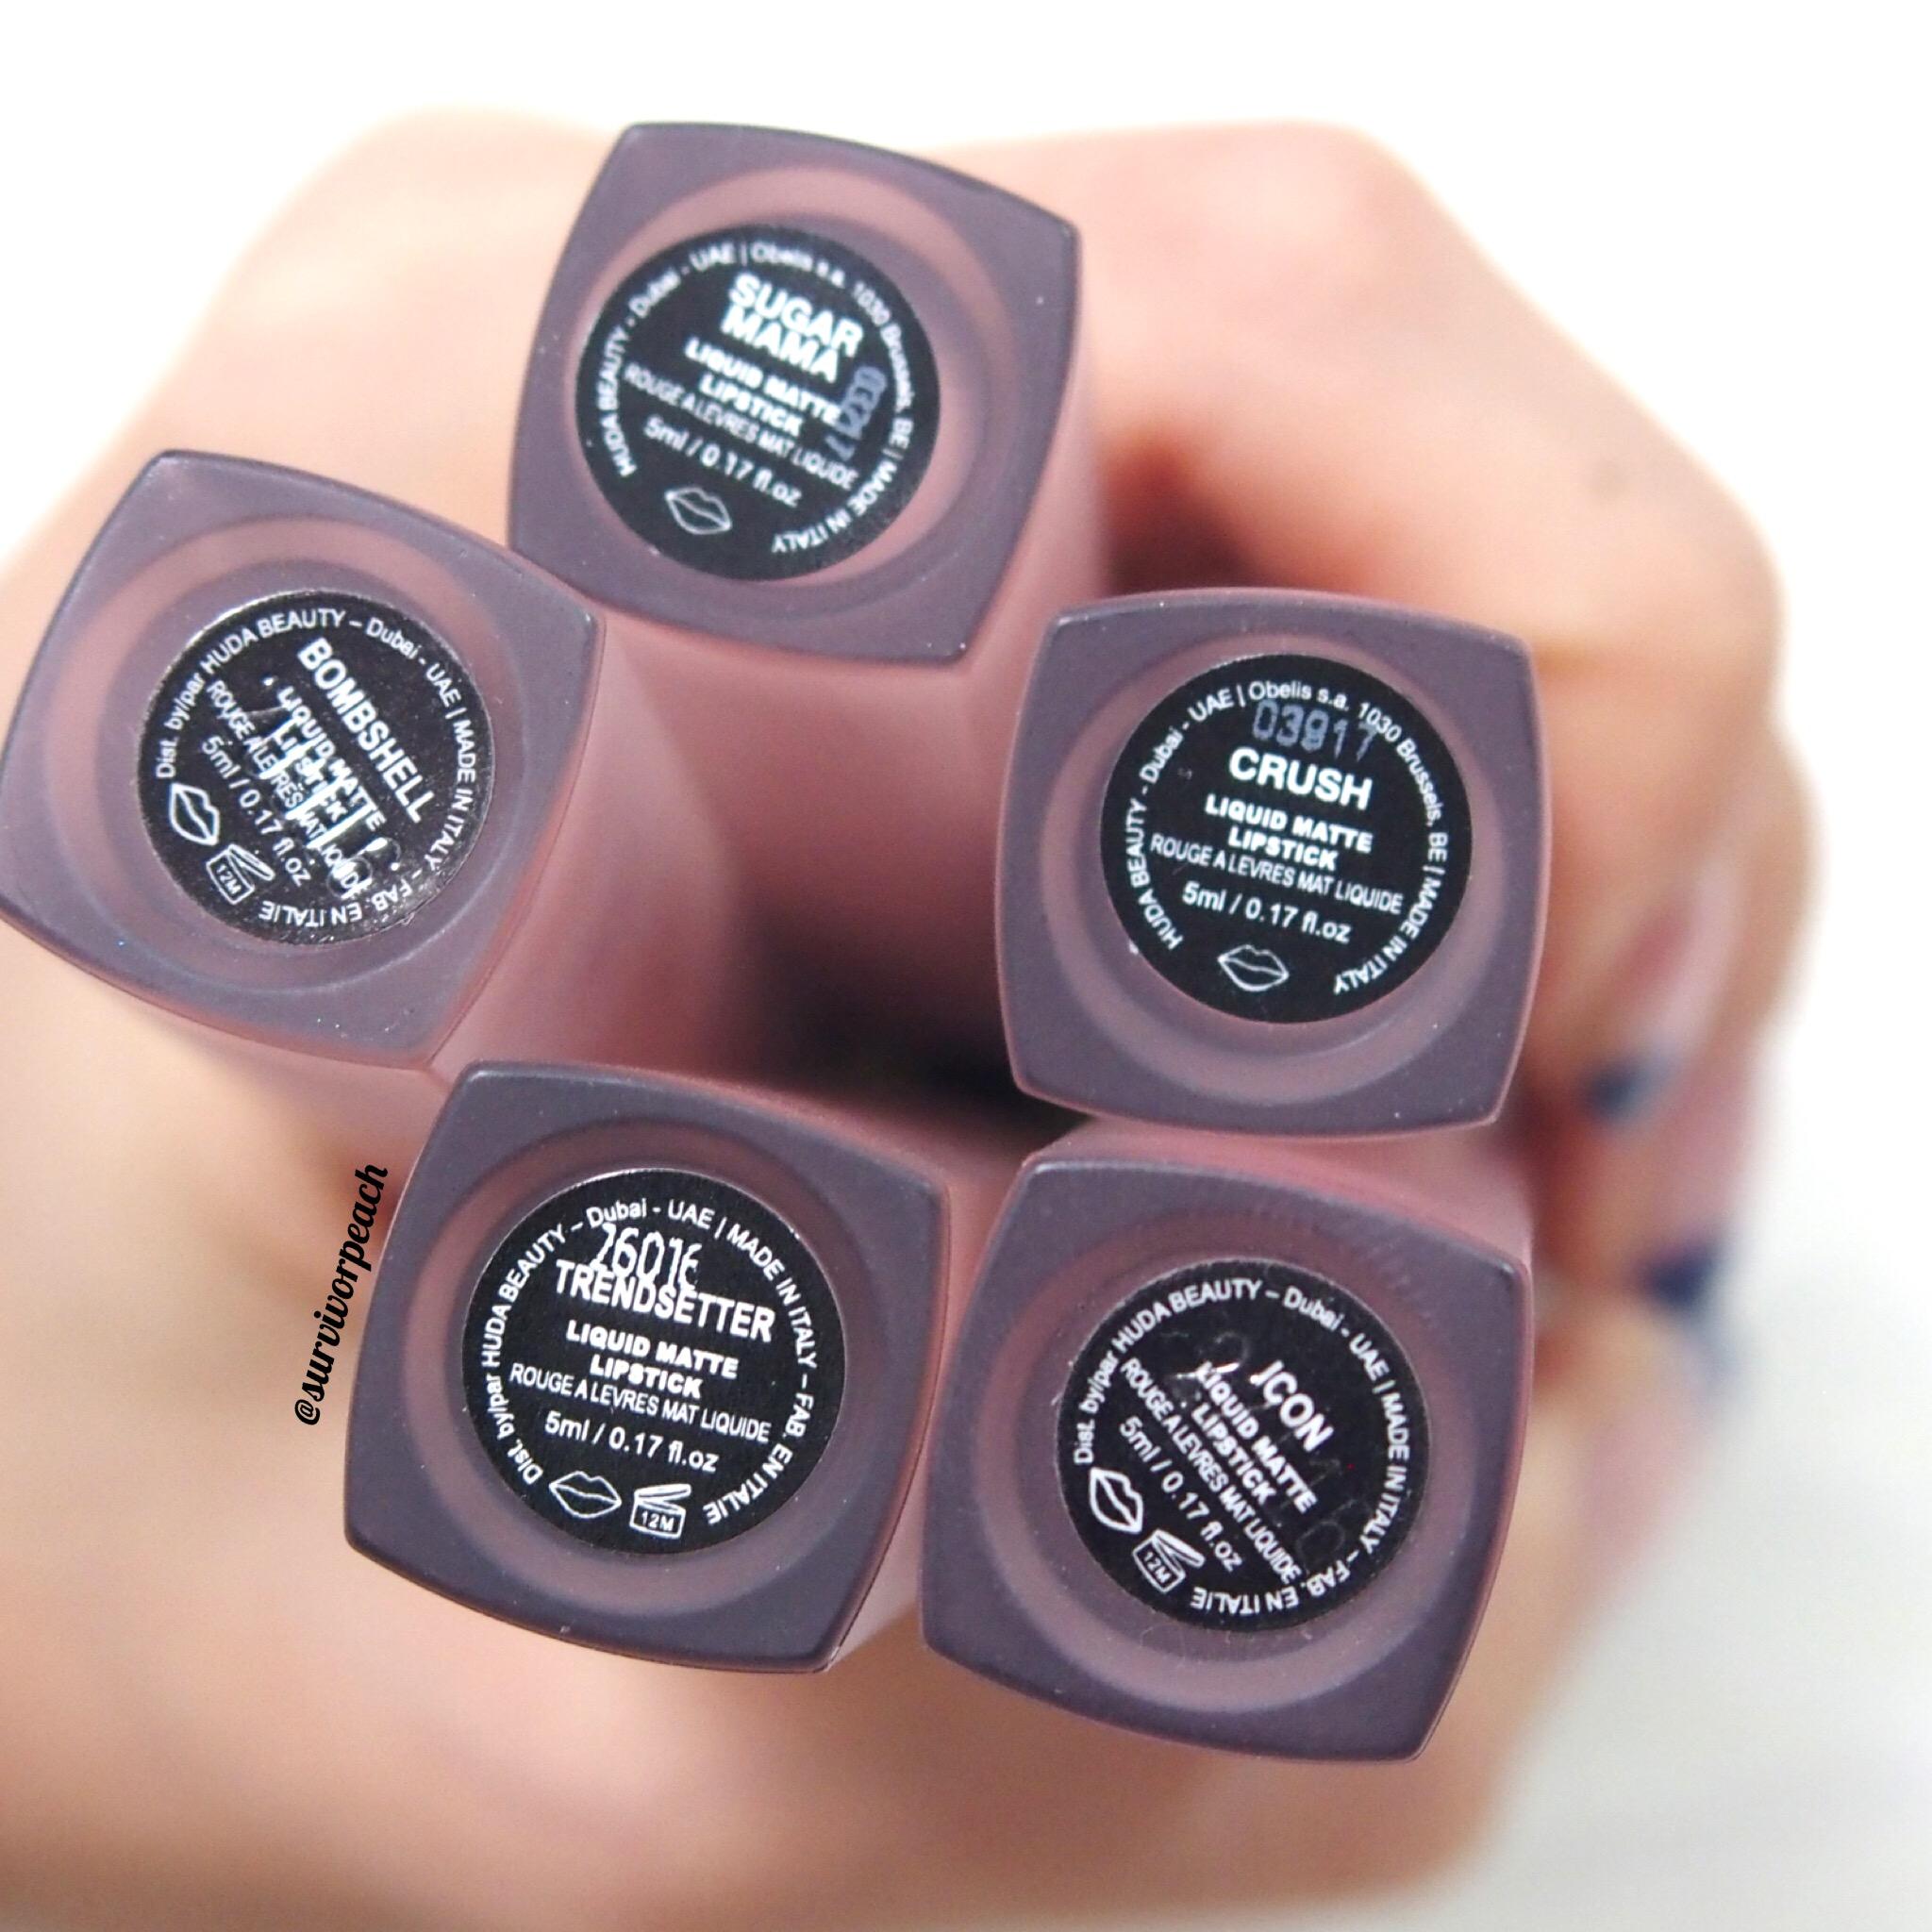 Huda Beauty Liquid Lipsticks in Crush, Sugar Mama, Bombshell, Trendsetter, and Icon.